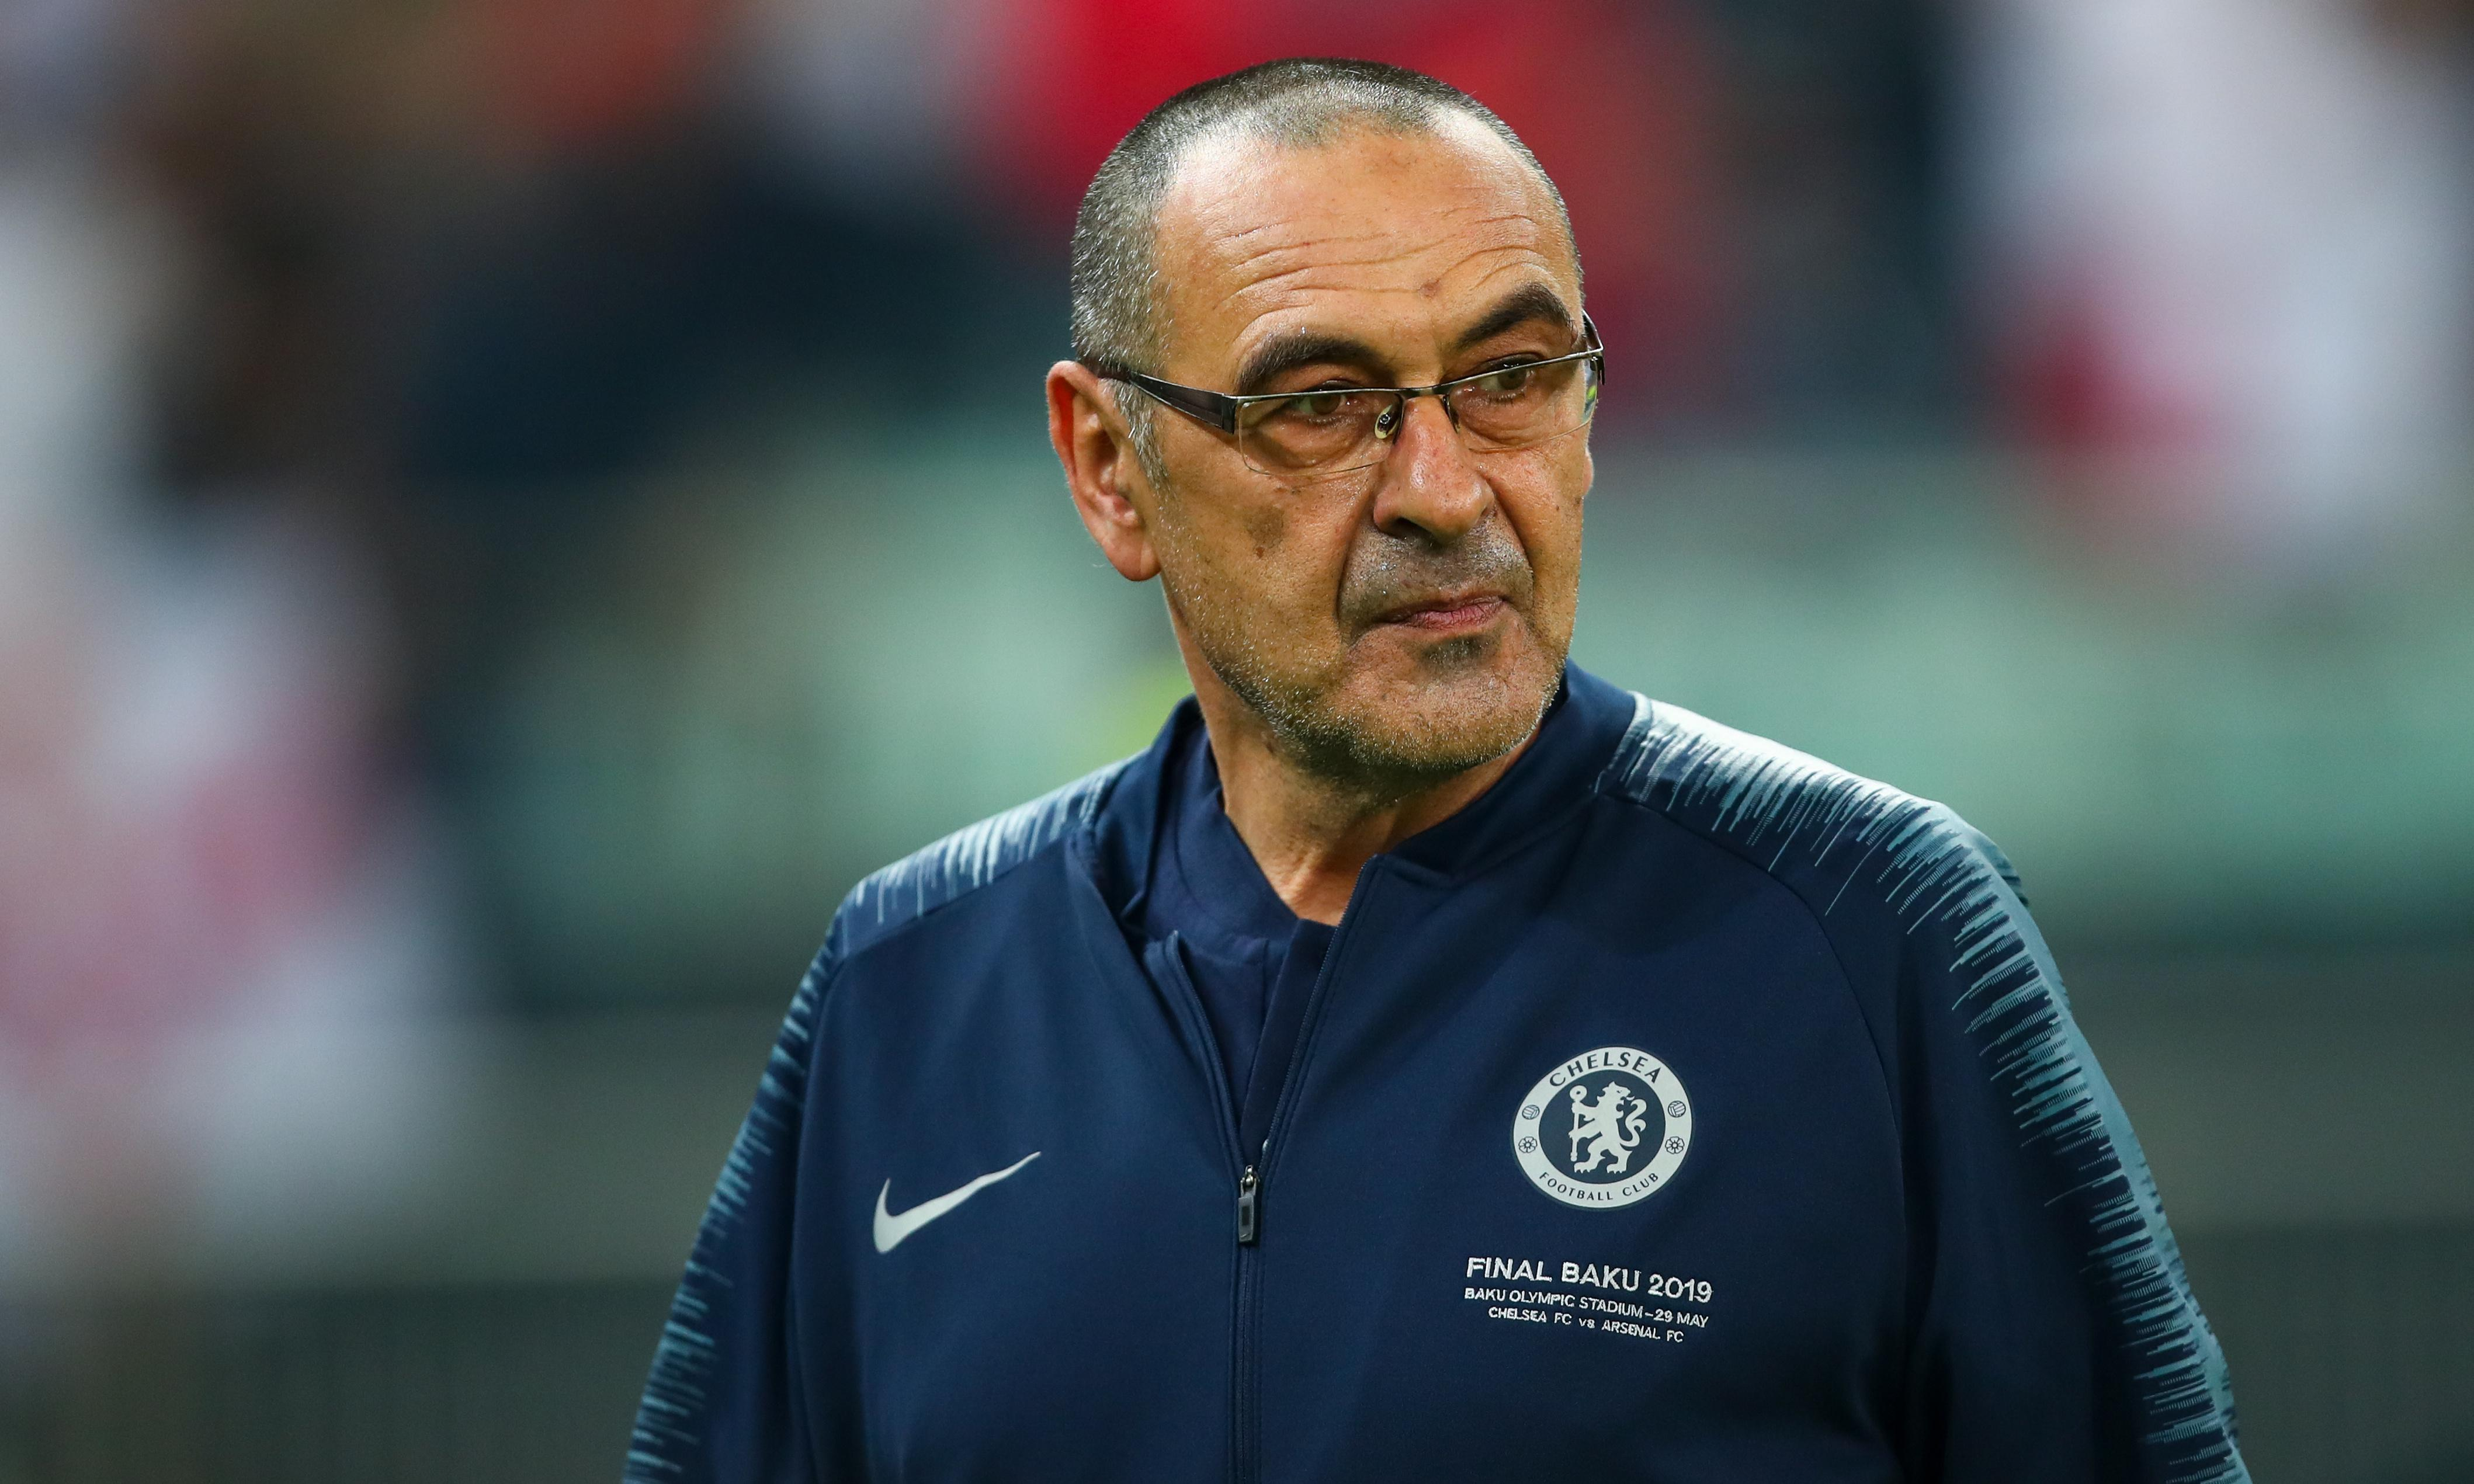 Juventus and Chelsea reach agreement in principle over Maurizio Sarri